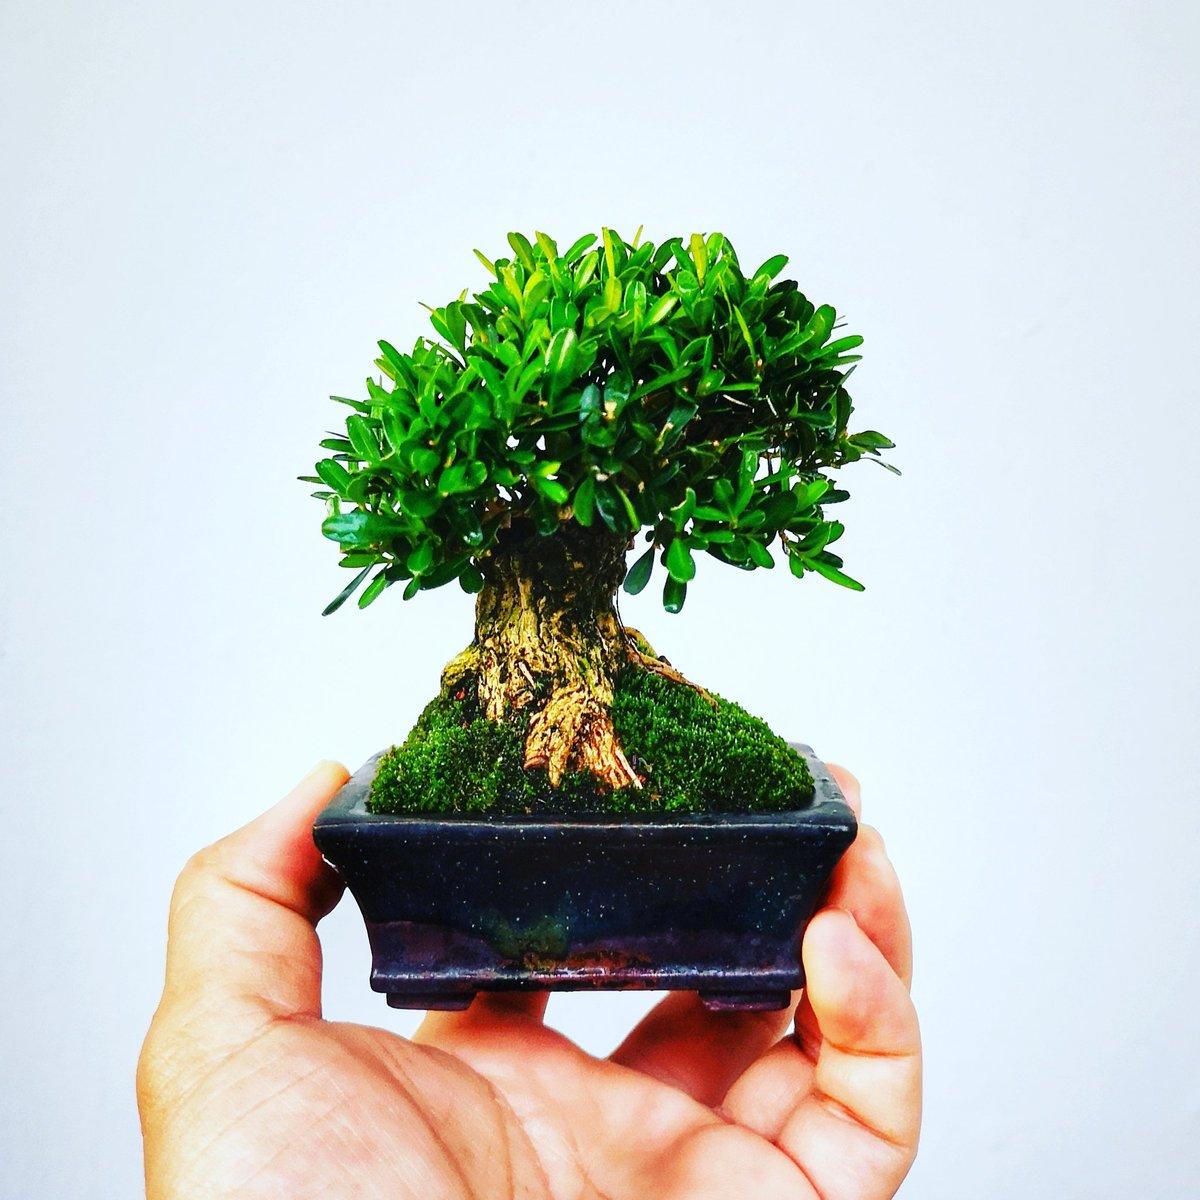 Mini mee  #satsuki #life #mame #plantsmakeyouhappy #shohin #toptags #cute #buxus #senjumaru #kinzu #nature #instafollow #picoftheday #likeme #photooftheday #like4like #instadaily #gardening #flowers #boxwood #bonsai #pyracantha #ipostyoubuy #botakbonsai #小品盆栽pic.twitter.com/qoYm04I7OB